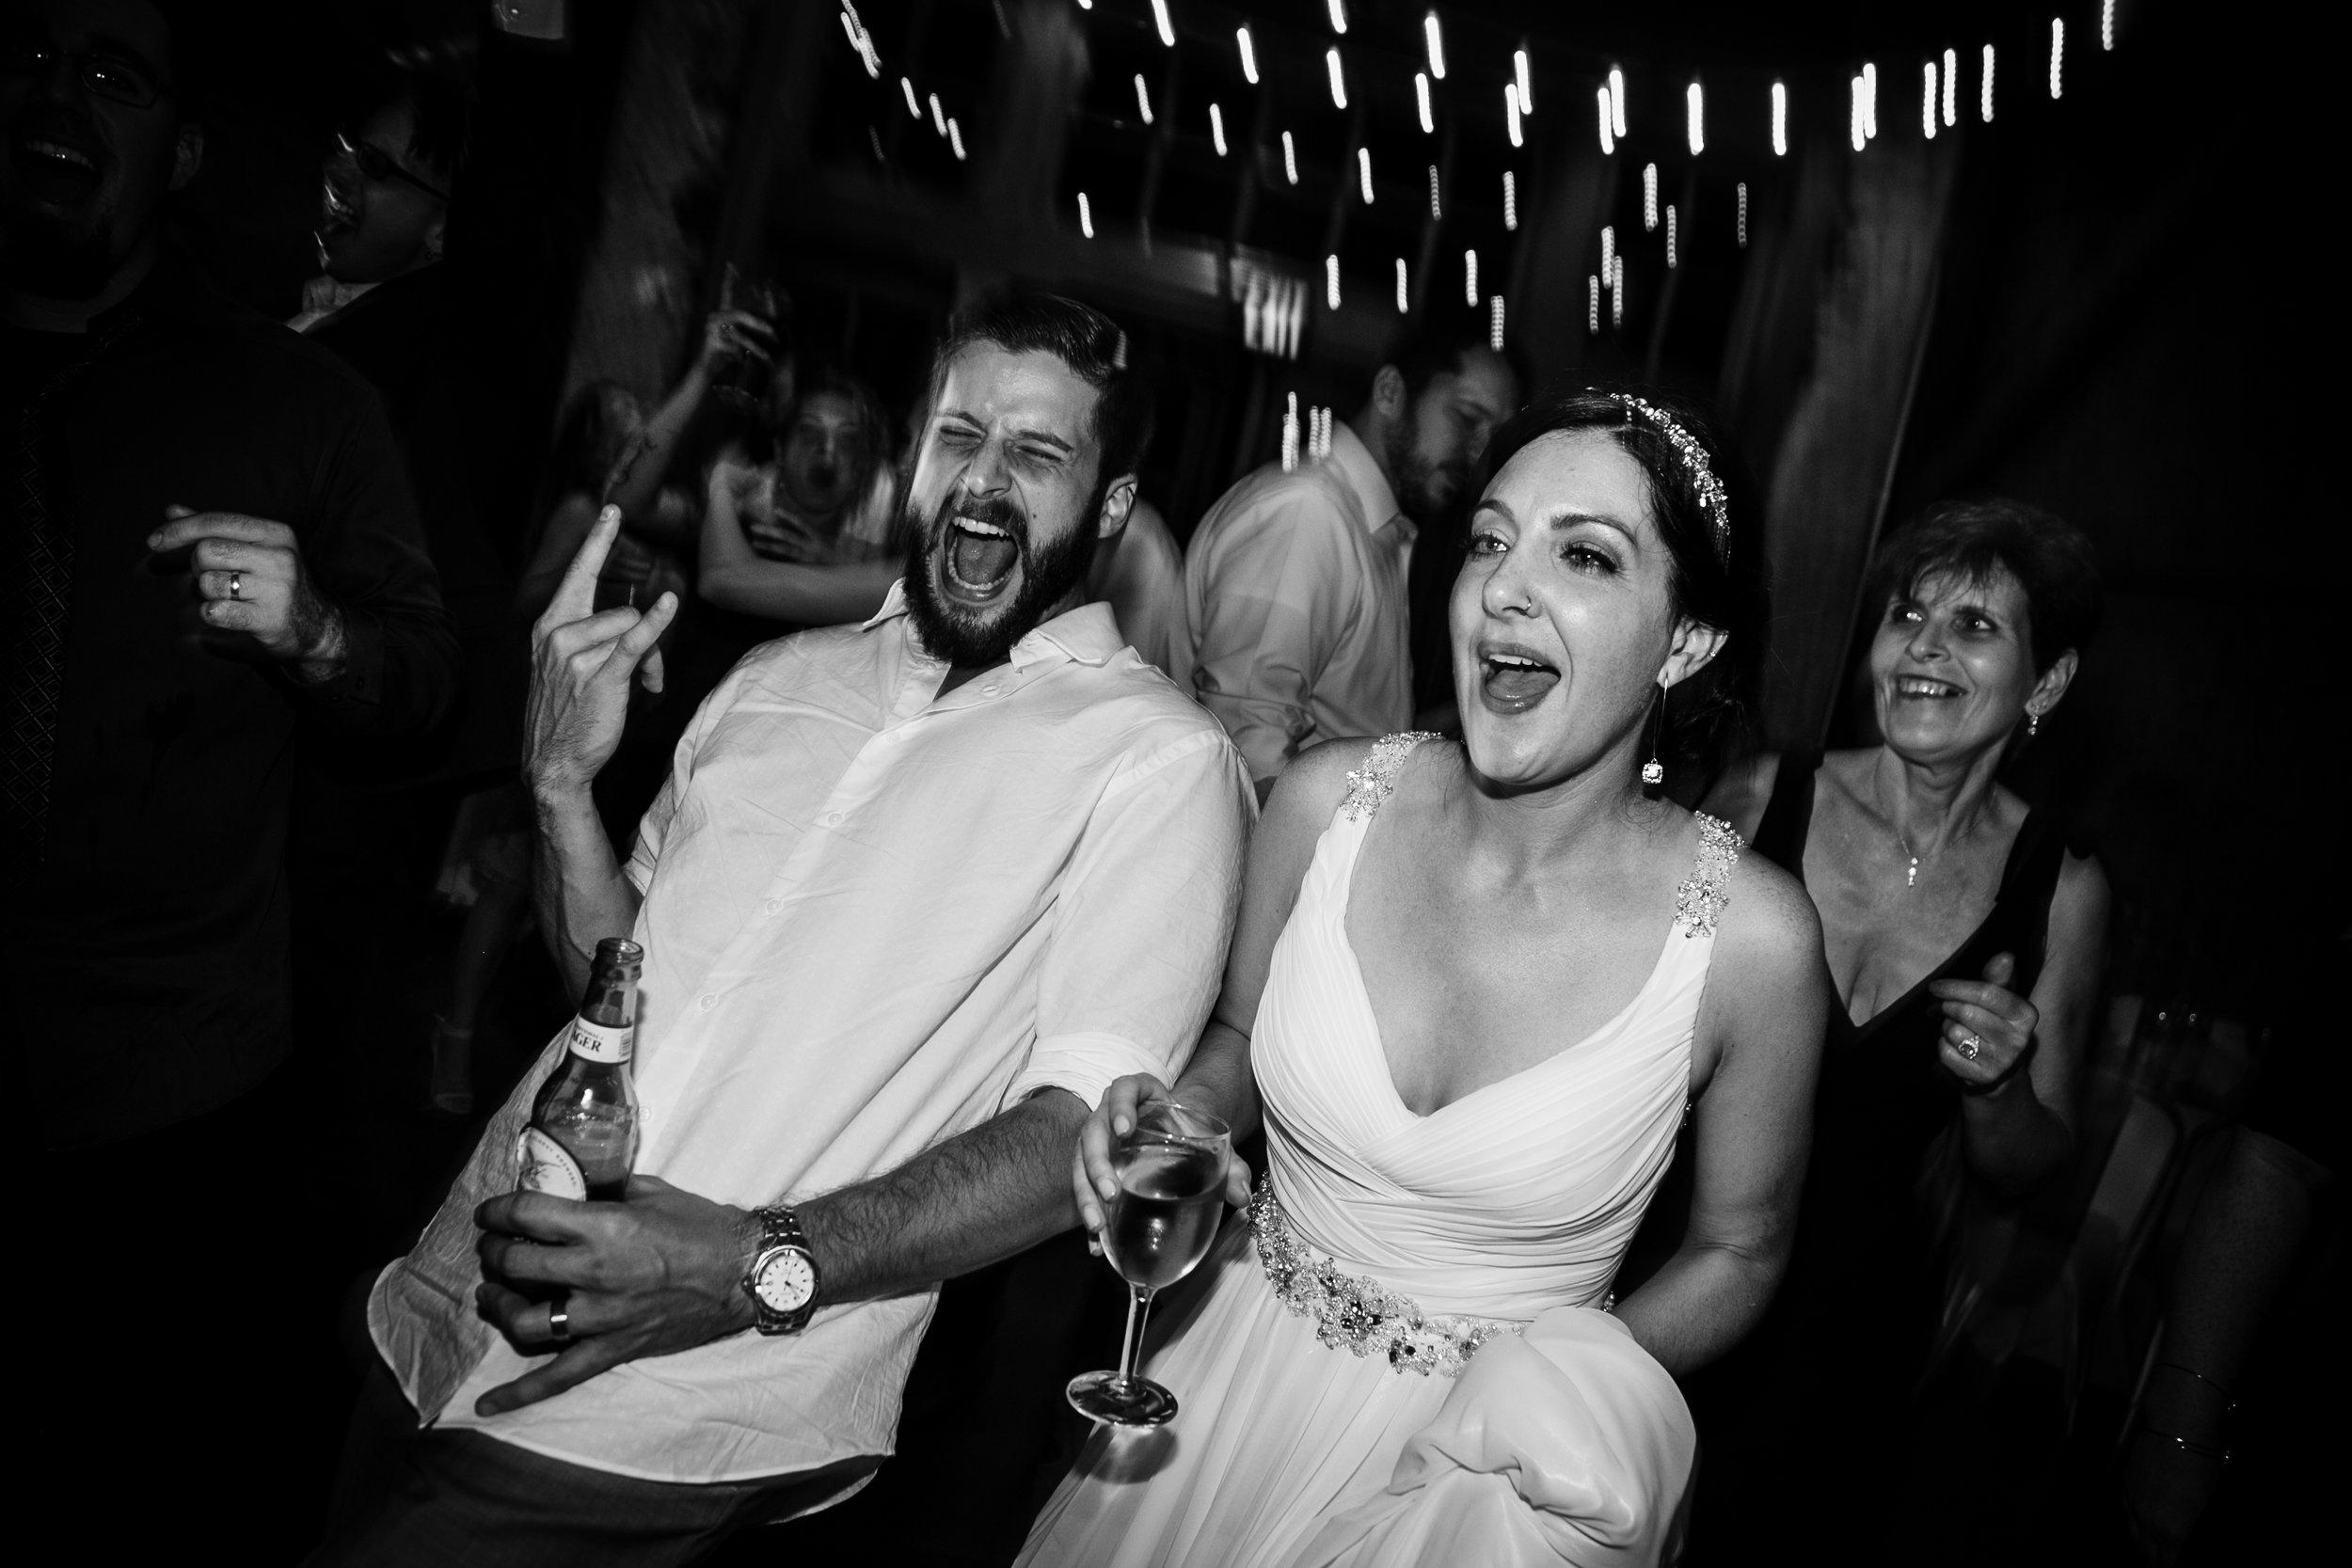 TYLER ARBORETUM WEDDING PHOTOGRAPHY LOVESTRUCK PICTURES-106.jpg